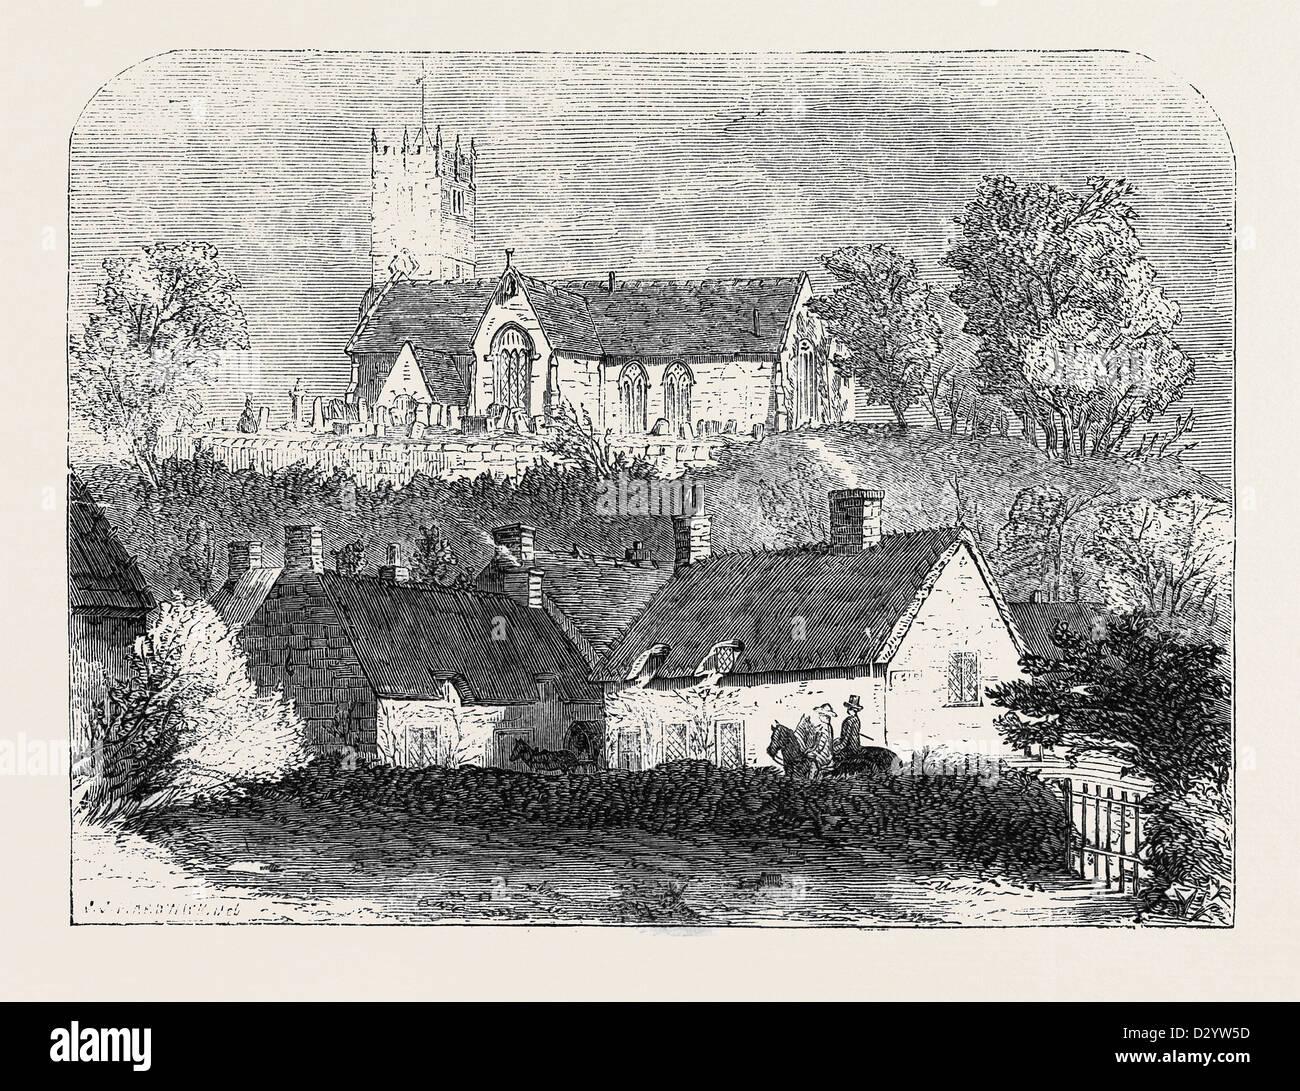 GODSHILL CRURCH ISLE OF WIGHT - Stock Image